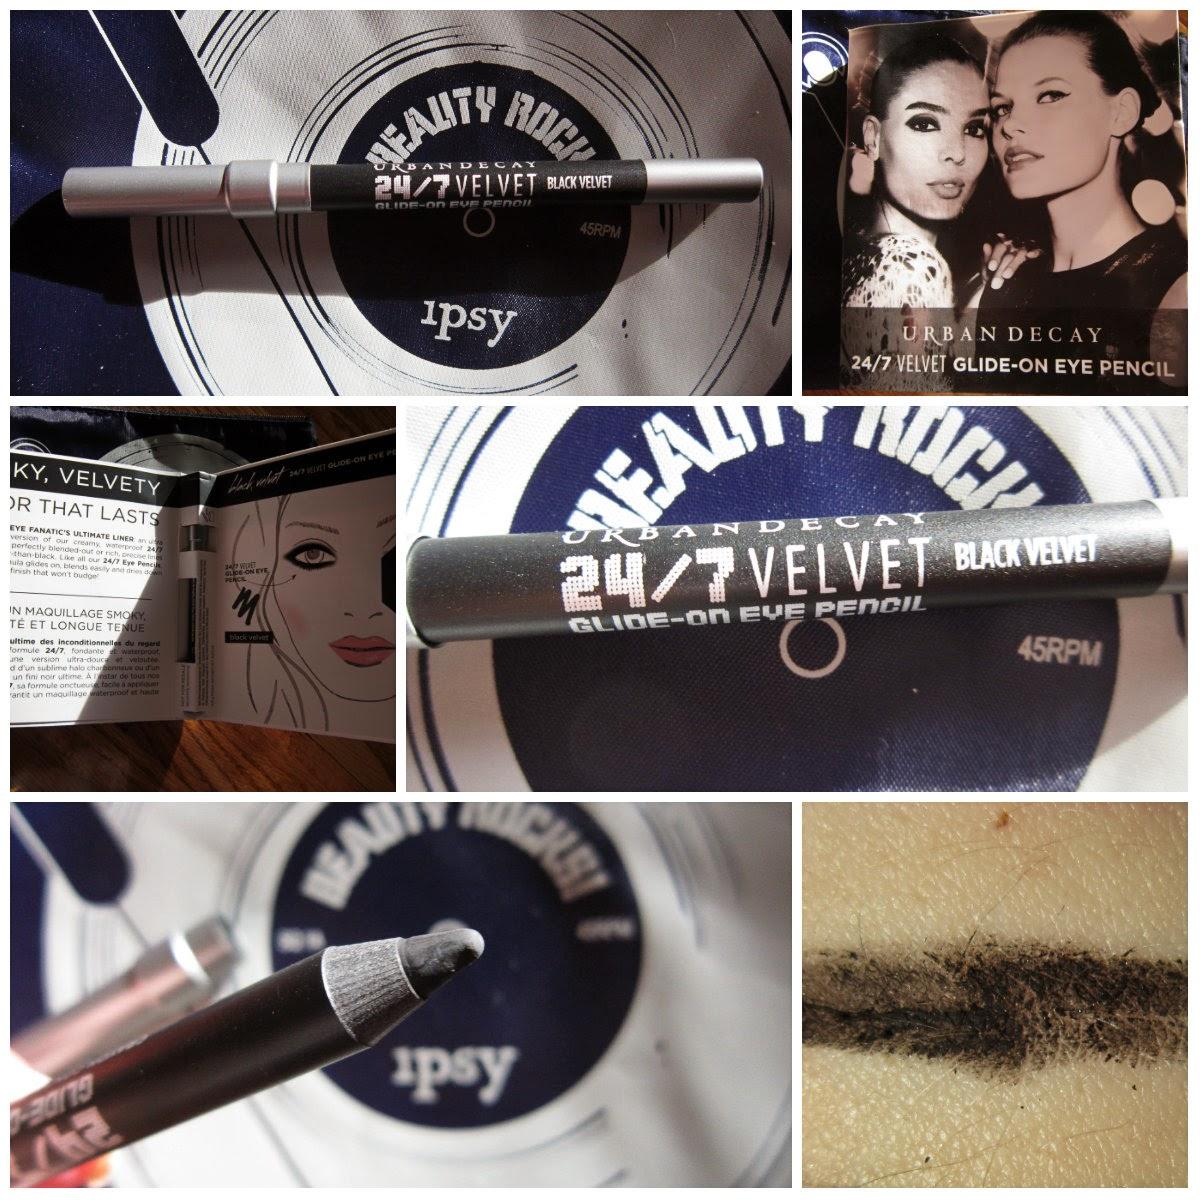 Urban Decay 24/7 Velvet Glide-On Eye Pencil Travel Size